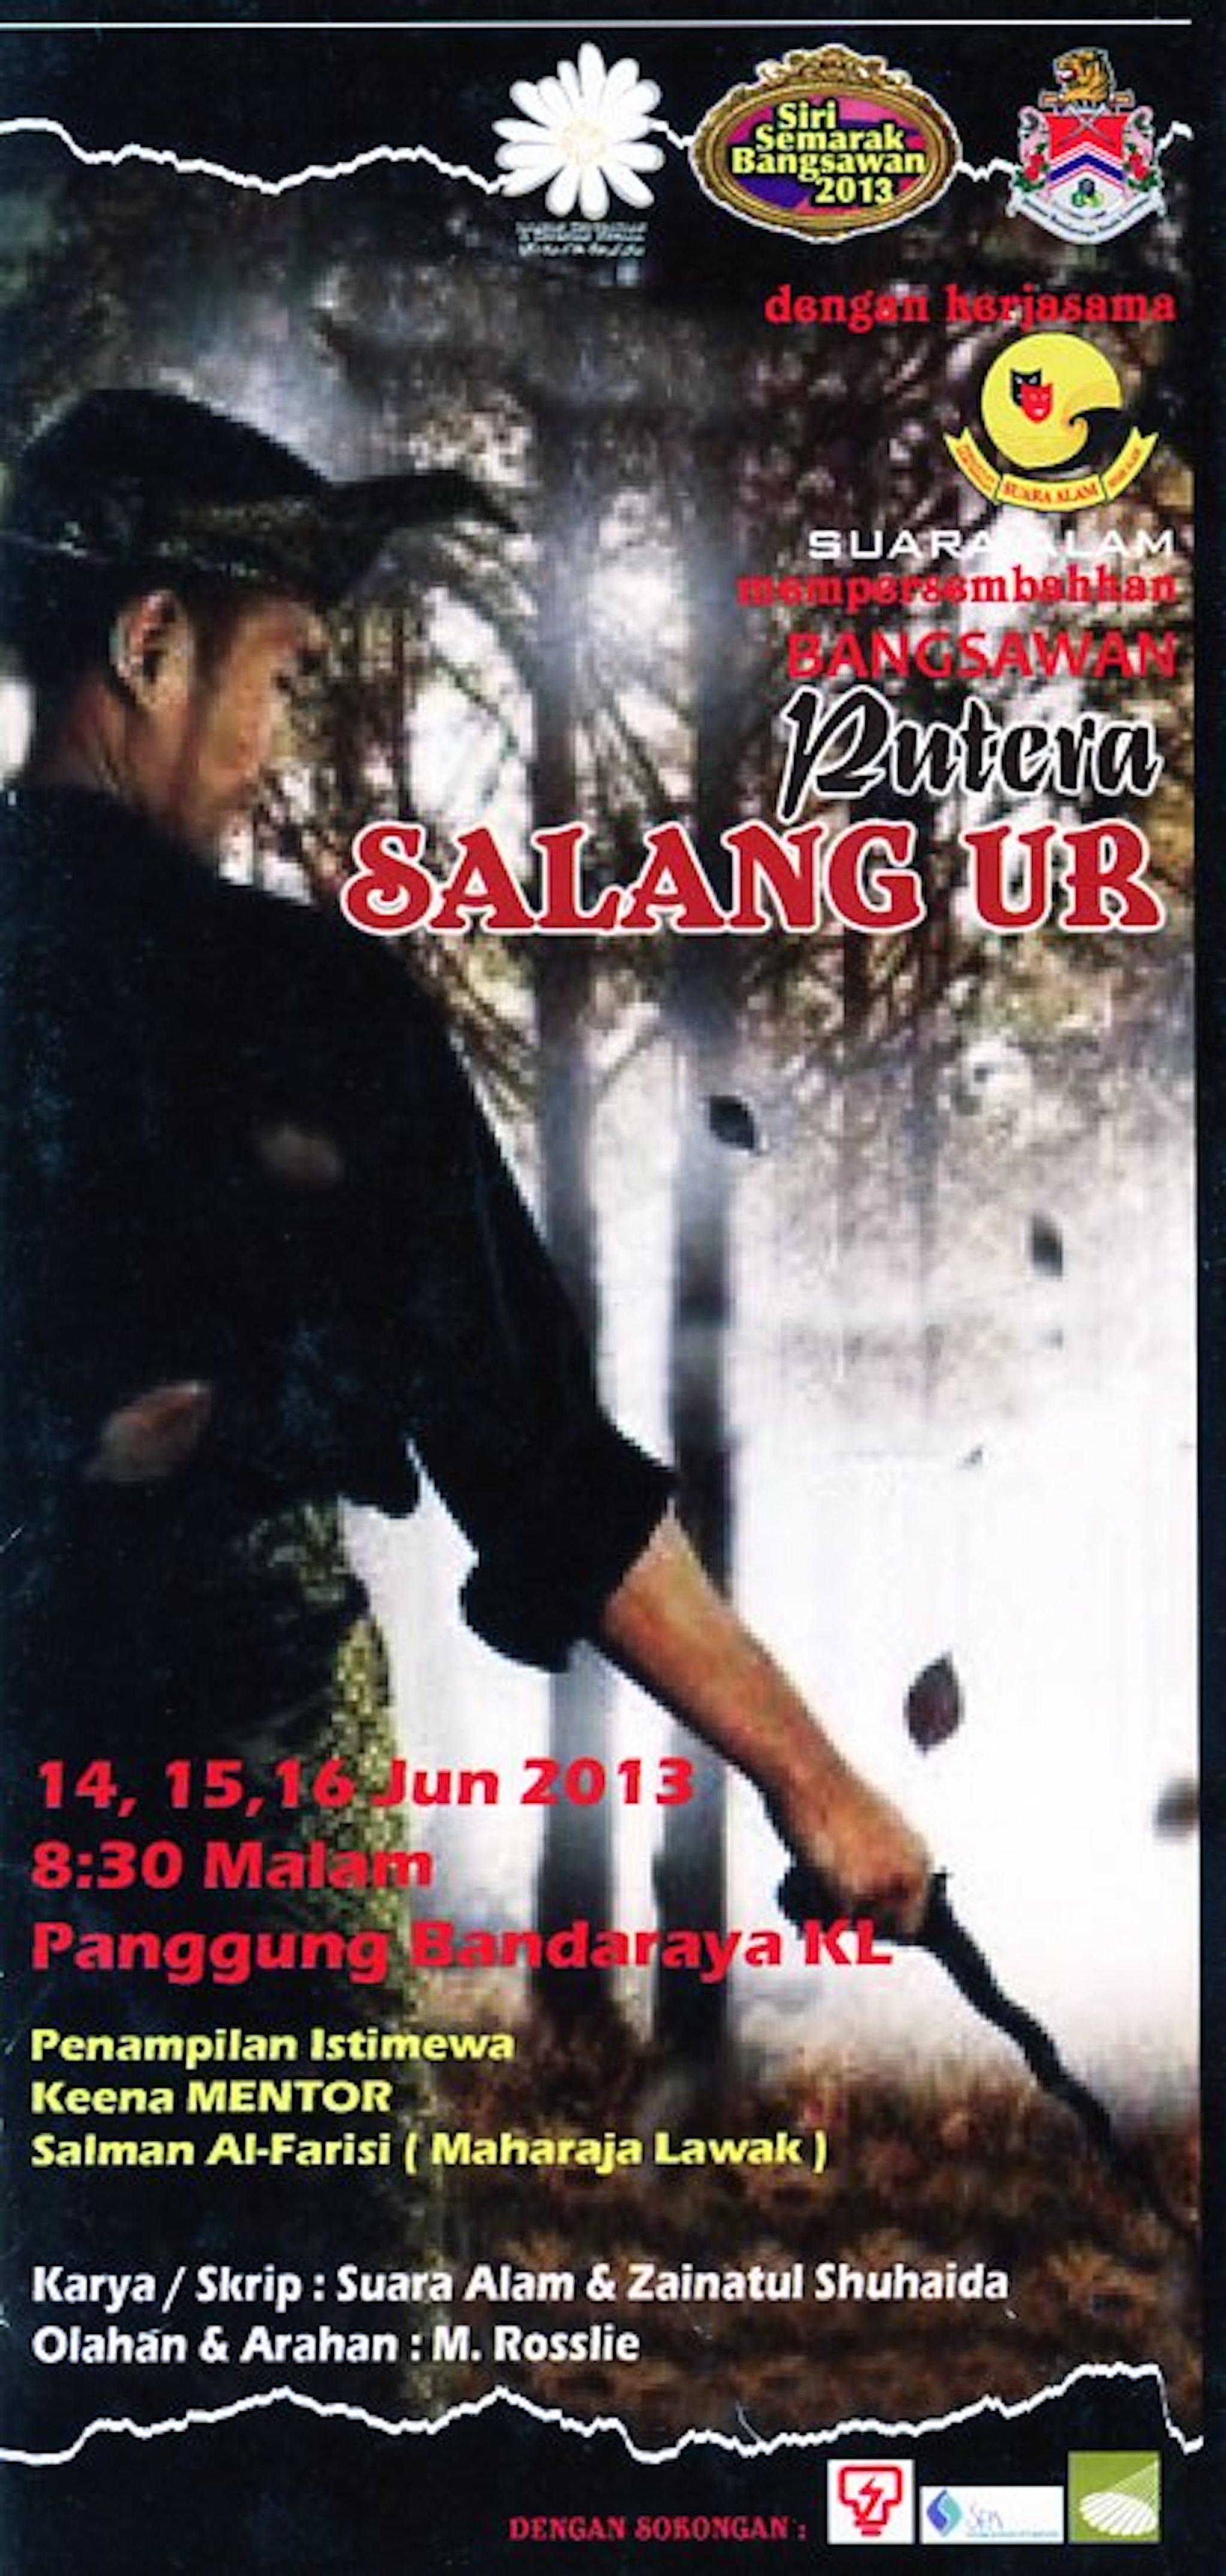 2013 Bangsawan Putera Salang Ur cover